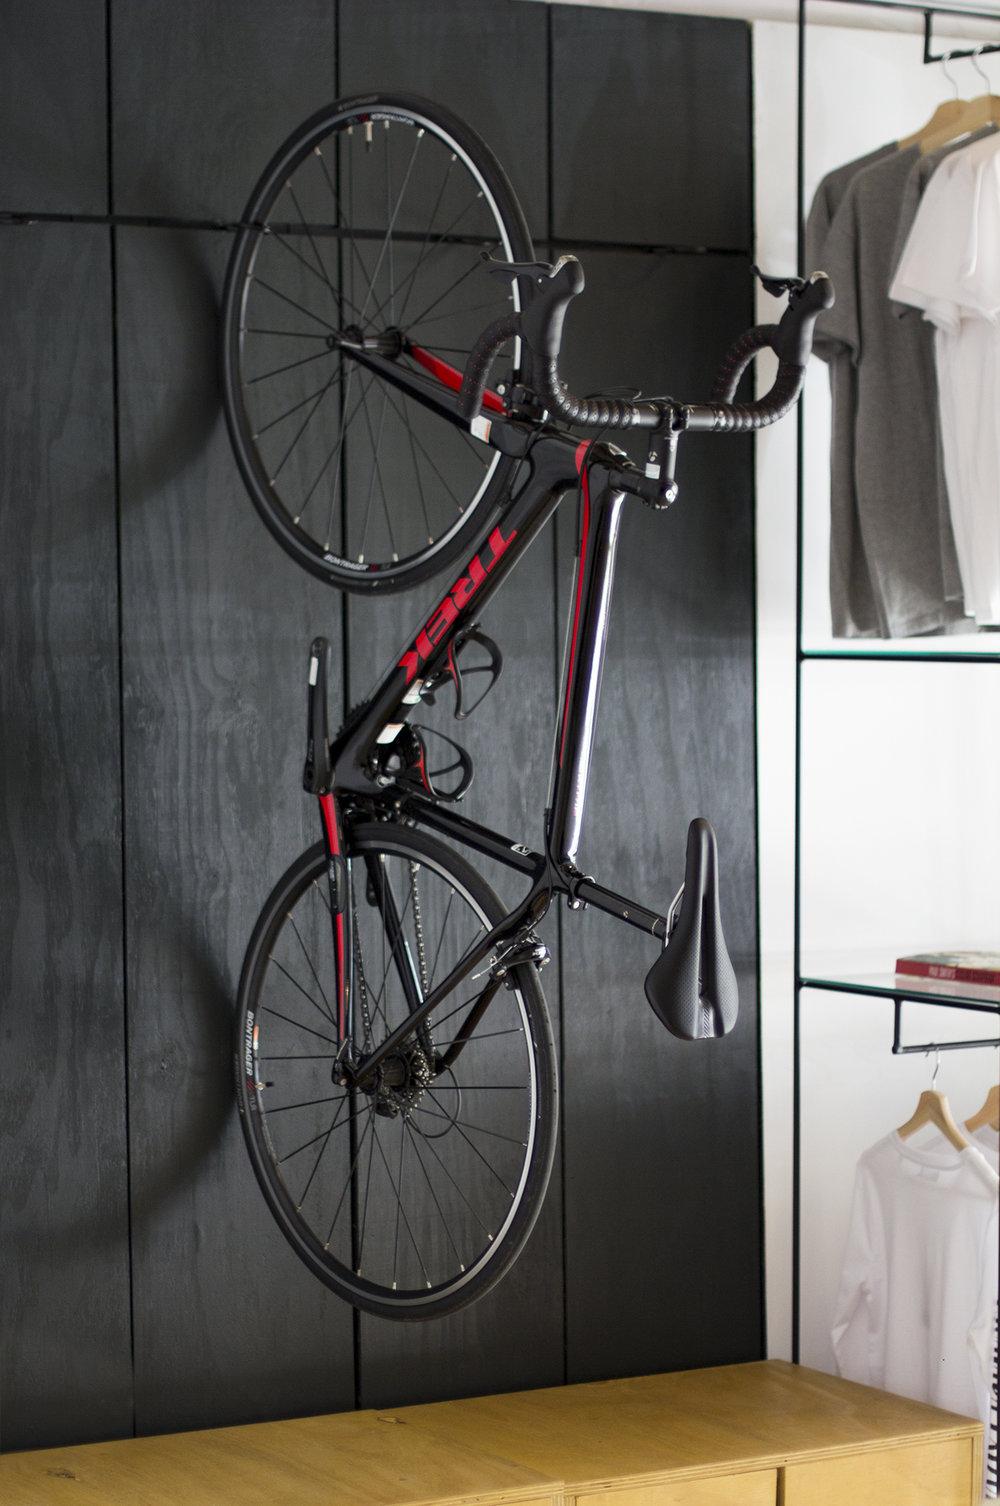 Malaga road bike rental services